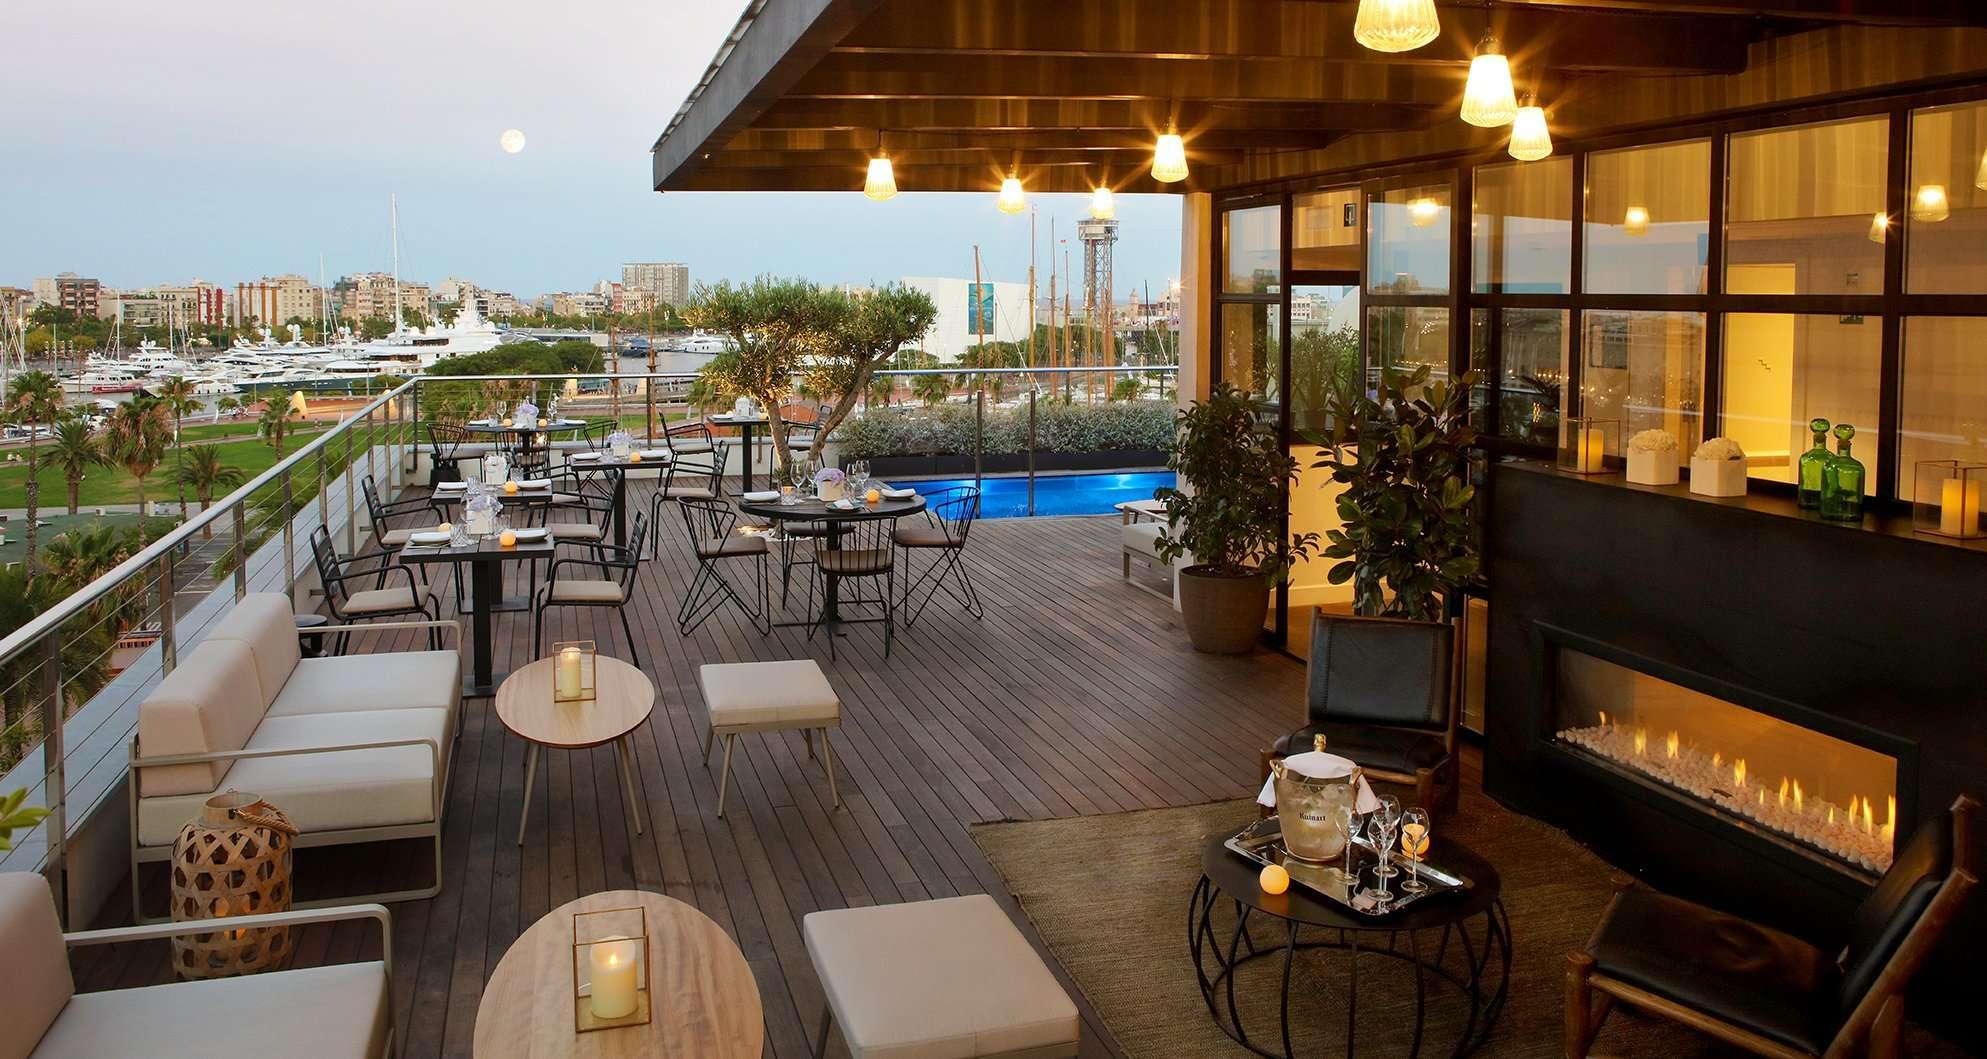 Los 8 mejores hoteles de espa a seg n tripadvisor tourse for Hoteles diseno espana